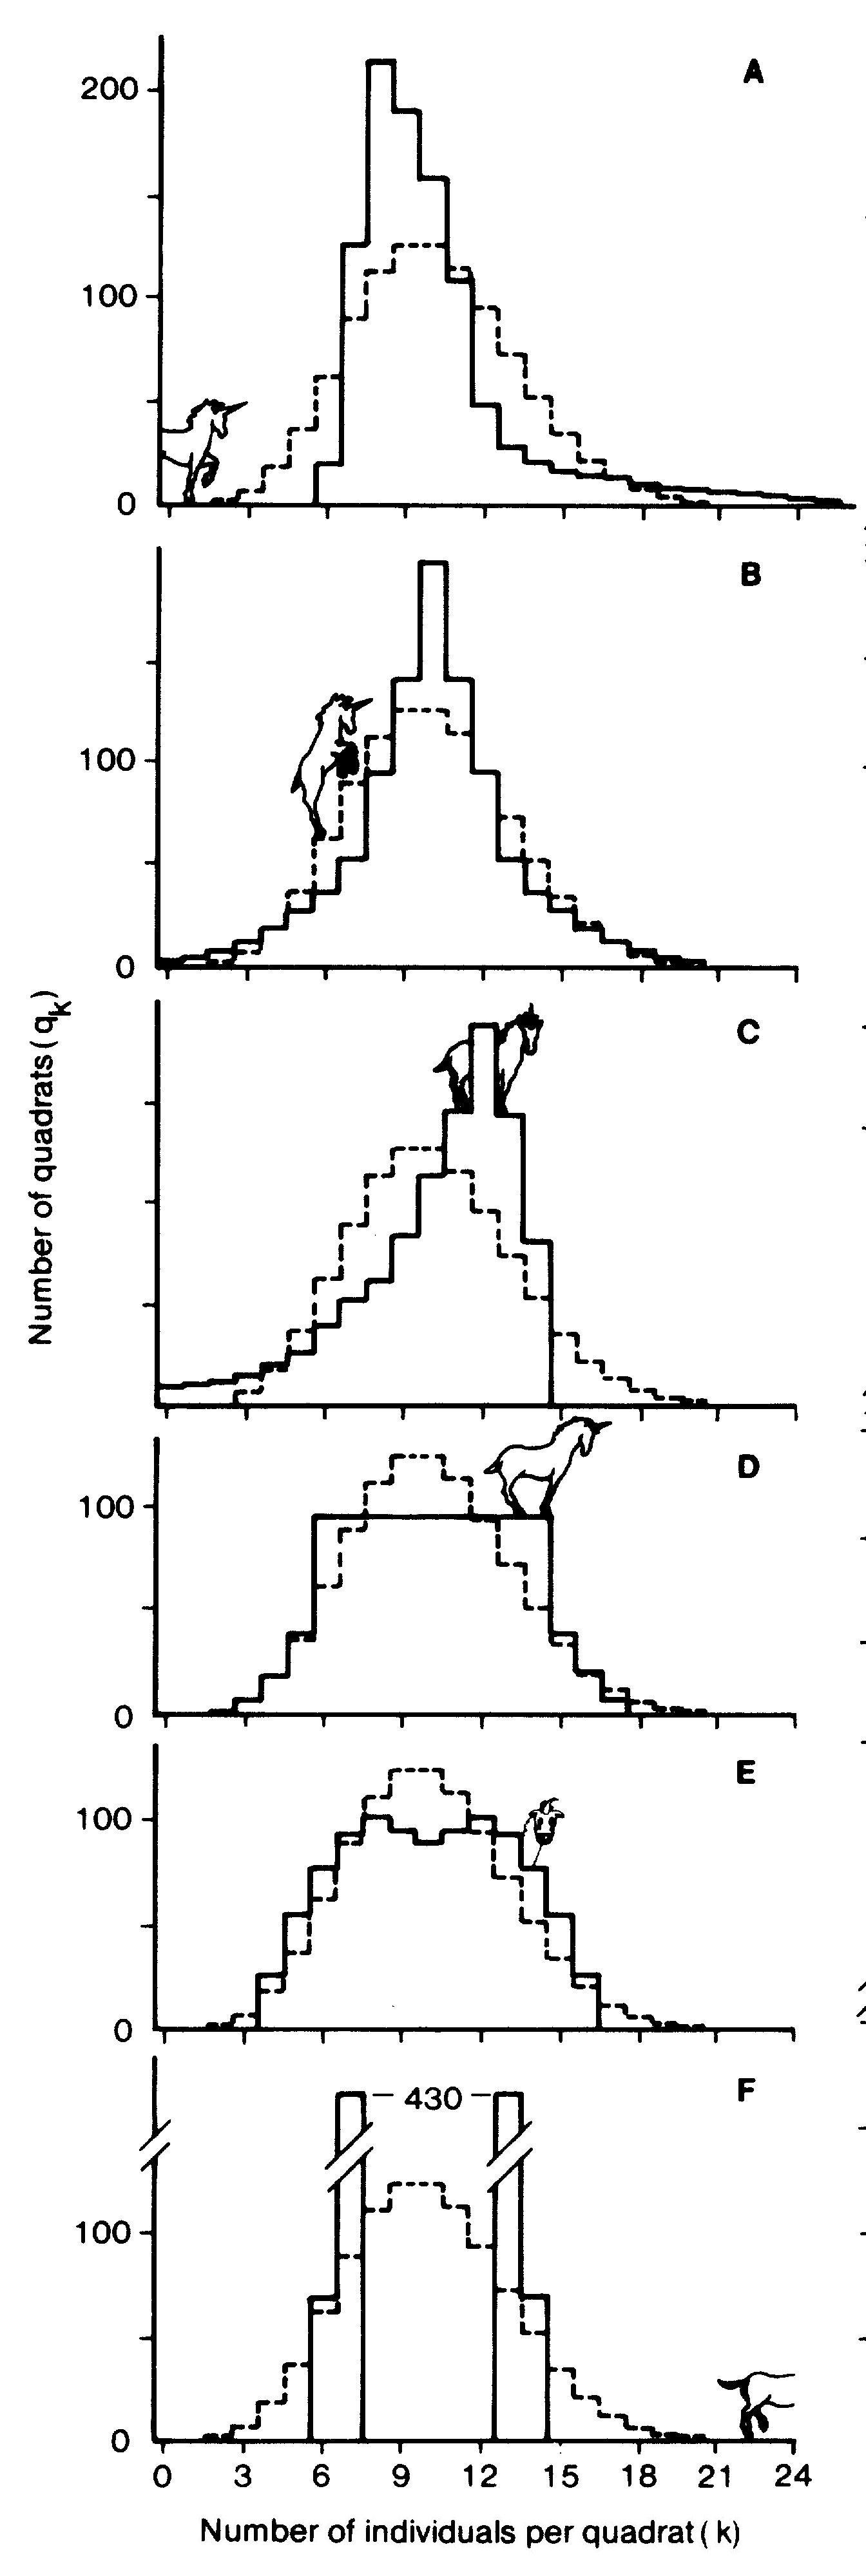 Part of Figure 1 from Hurlbert 1990